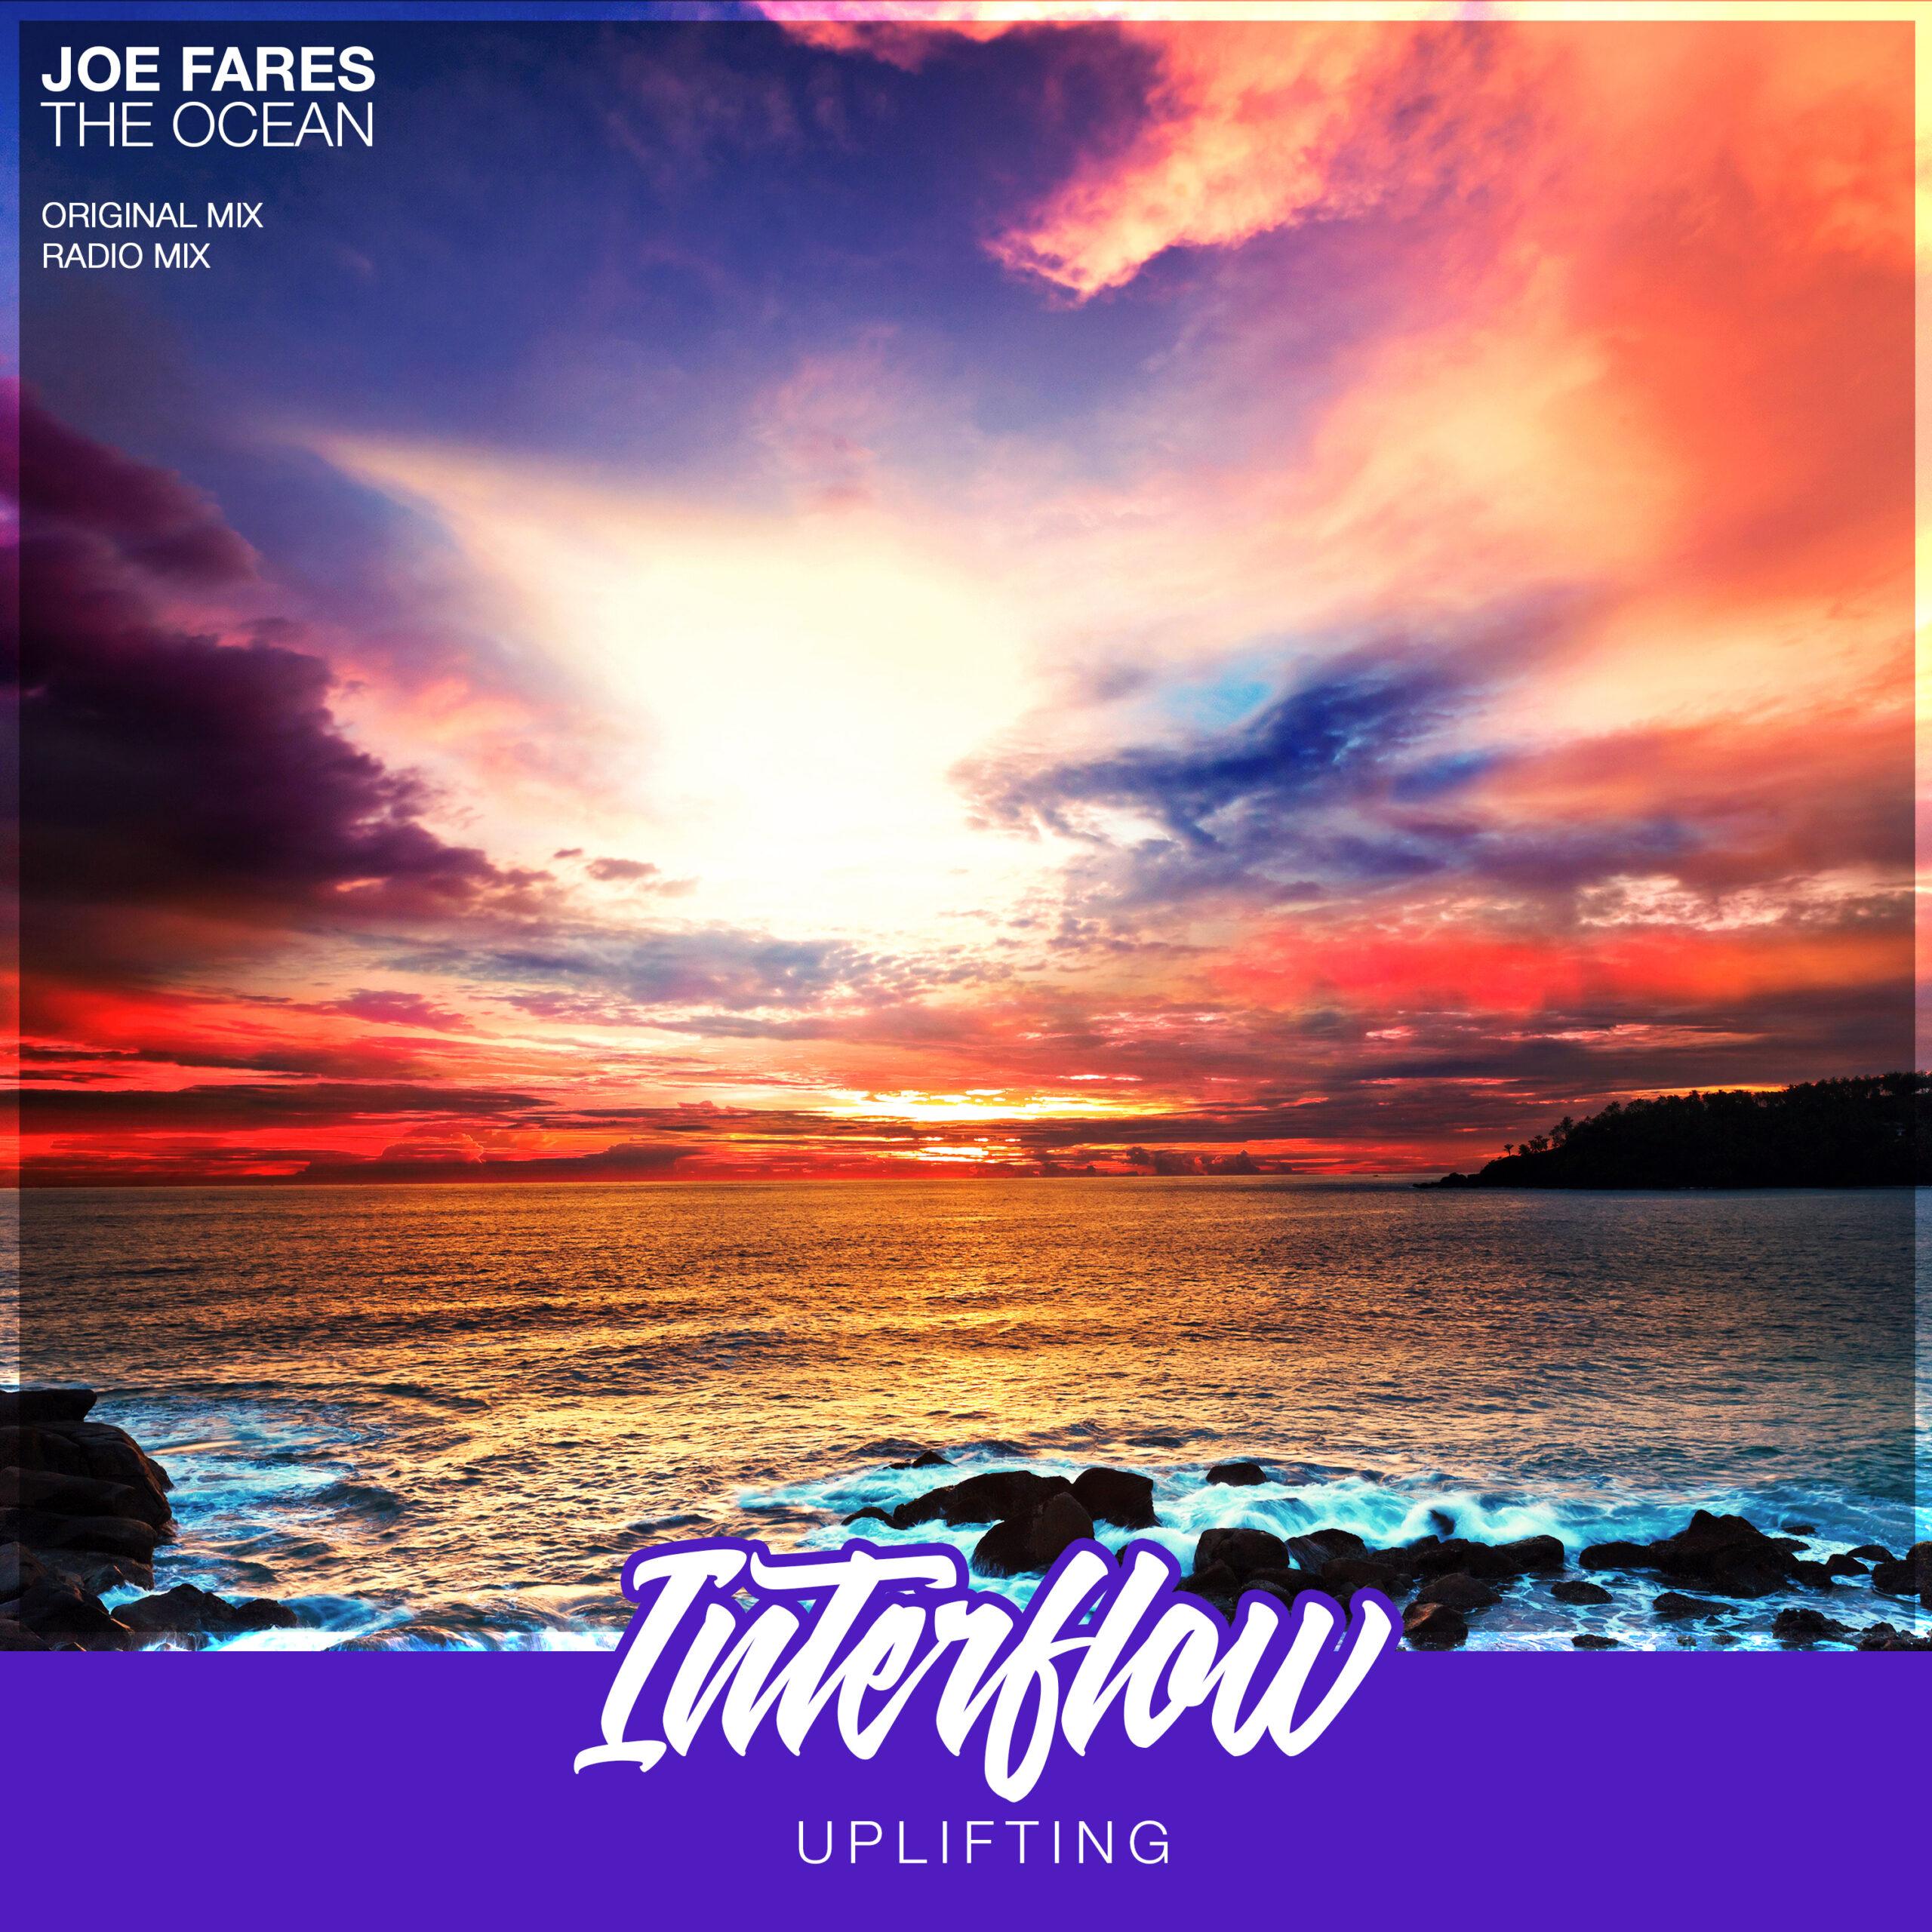 The Ocean by Joe Fares – Preview